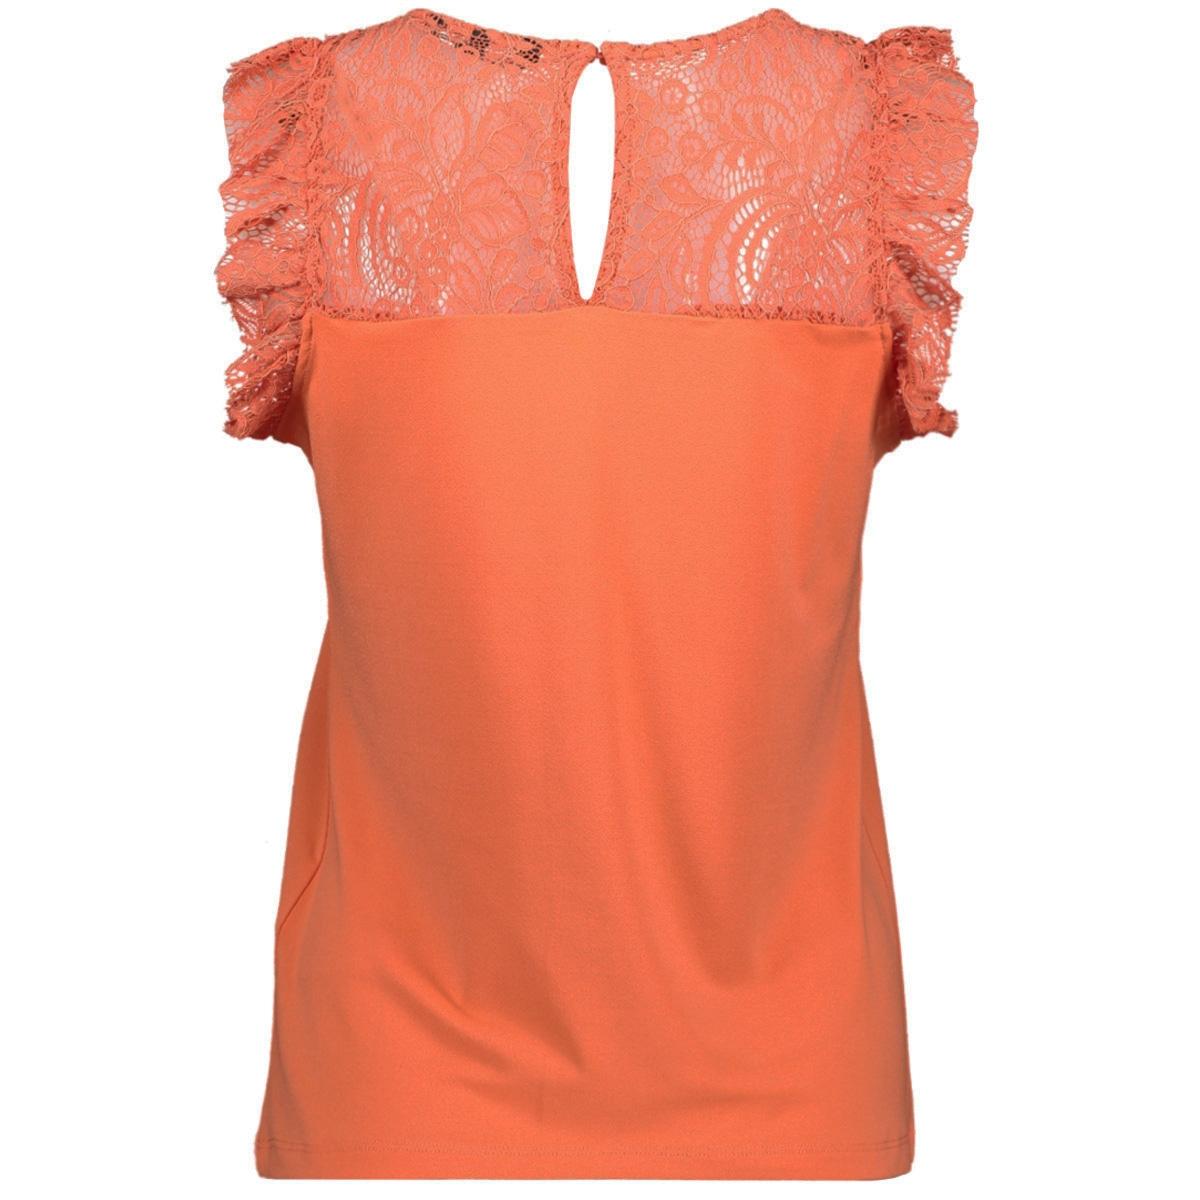 vmalberta sweetheart lace s/l top 10211607 vero moda top emberglow